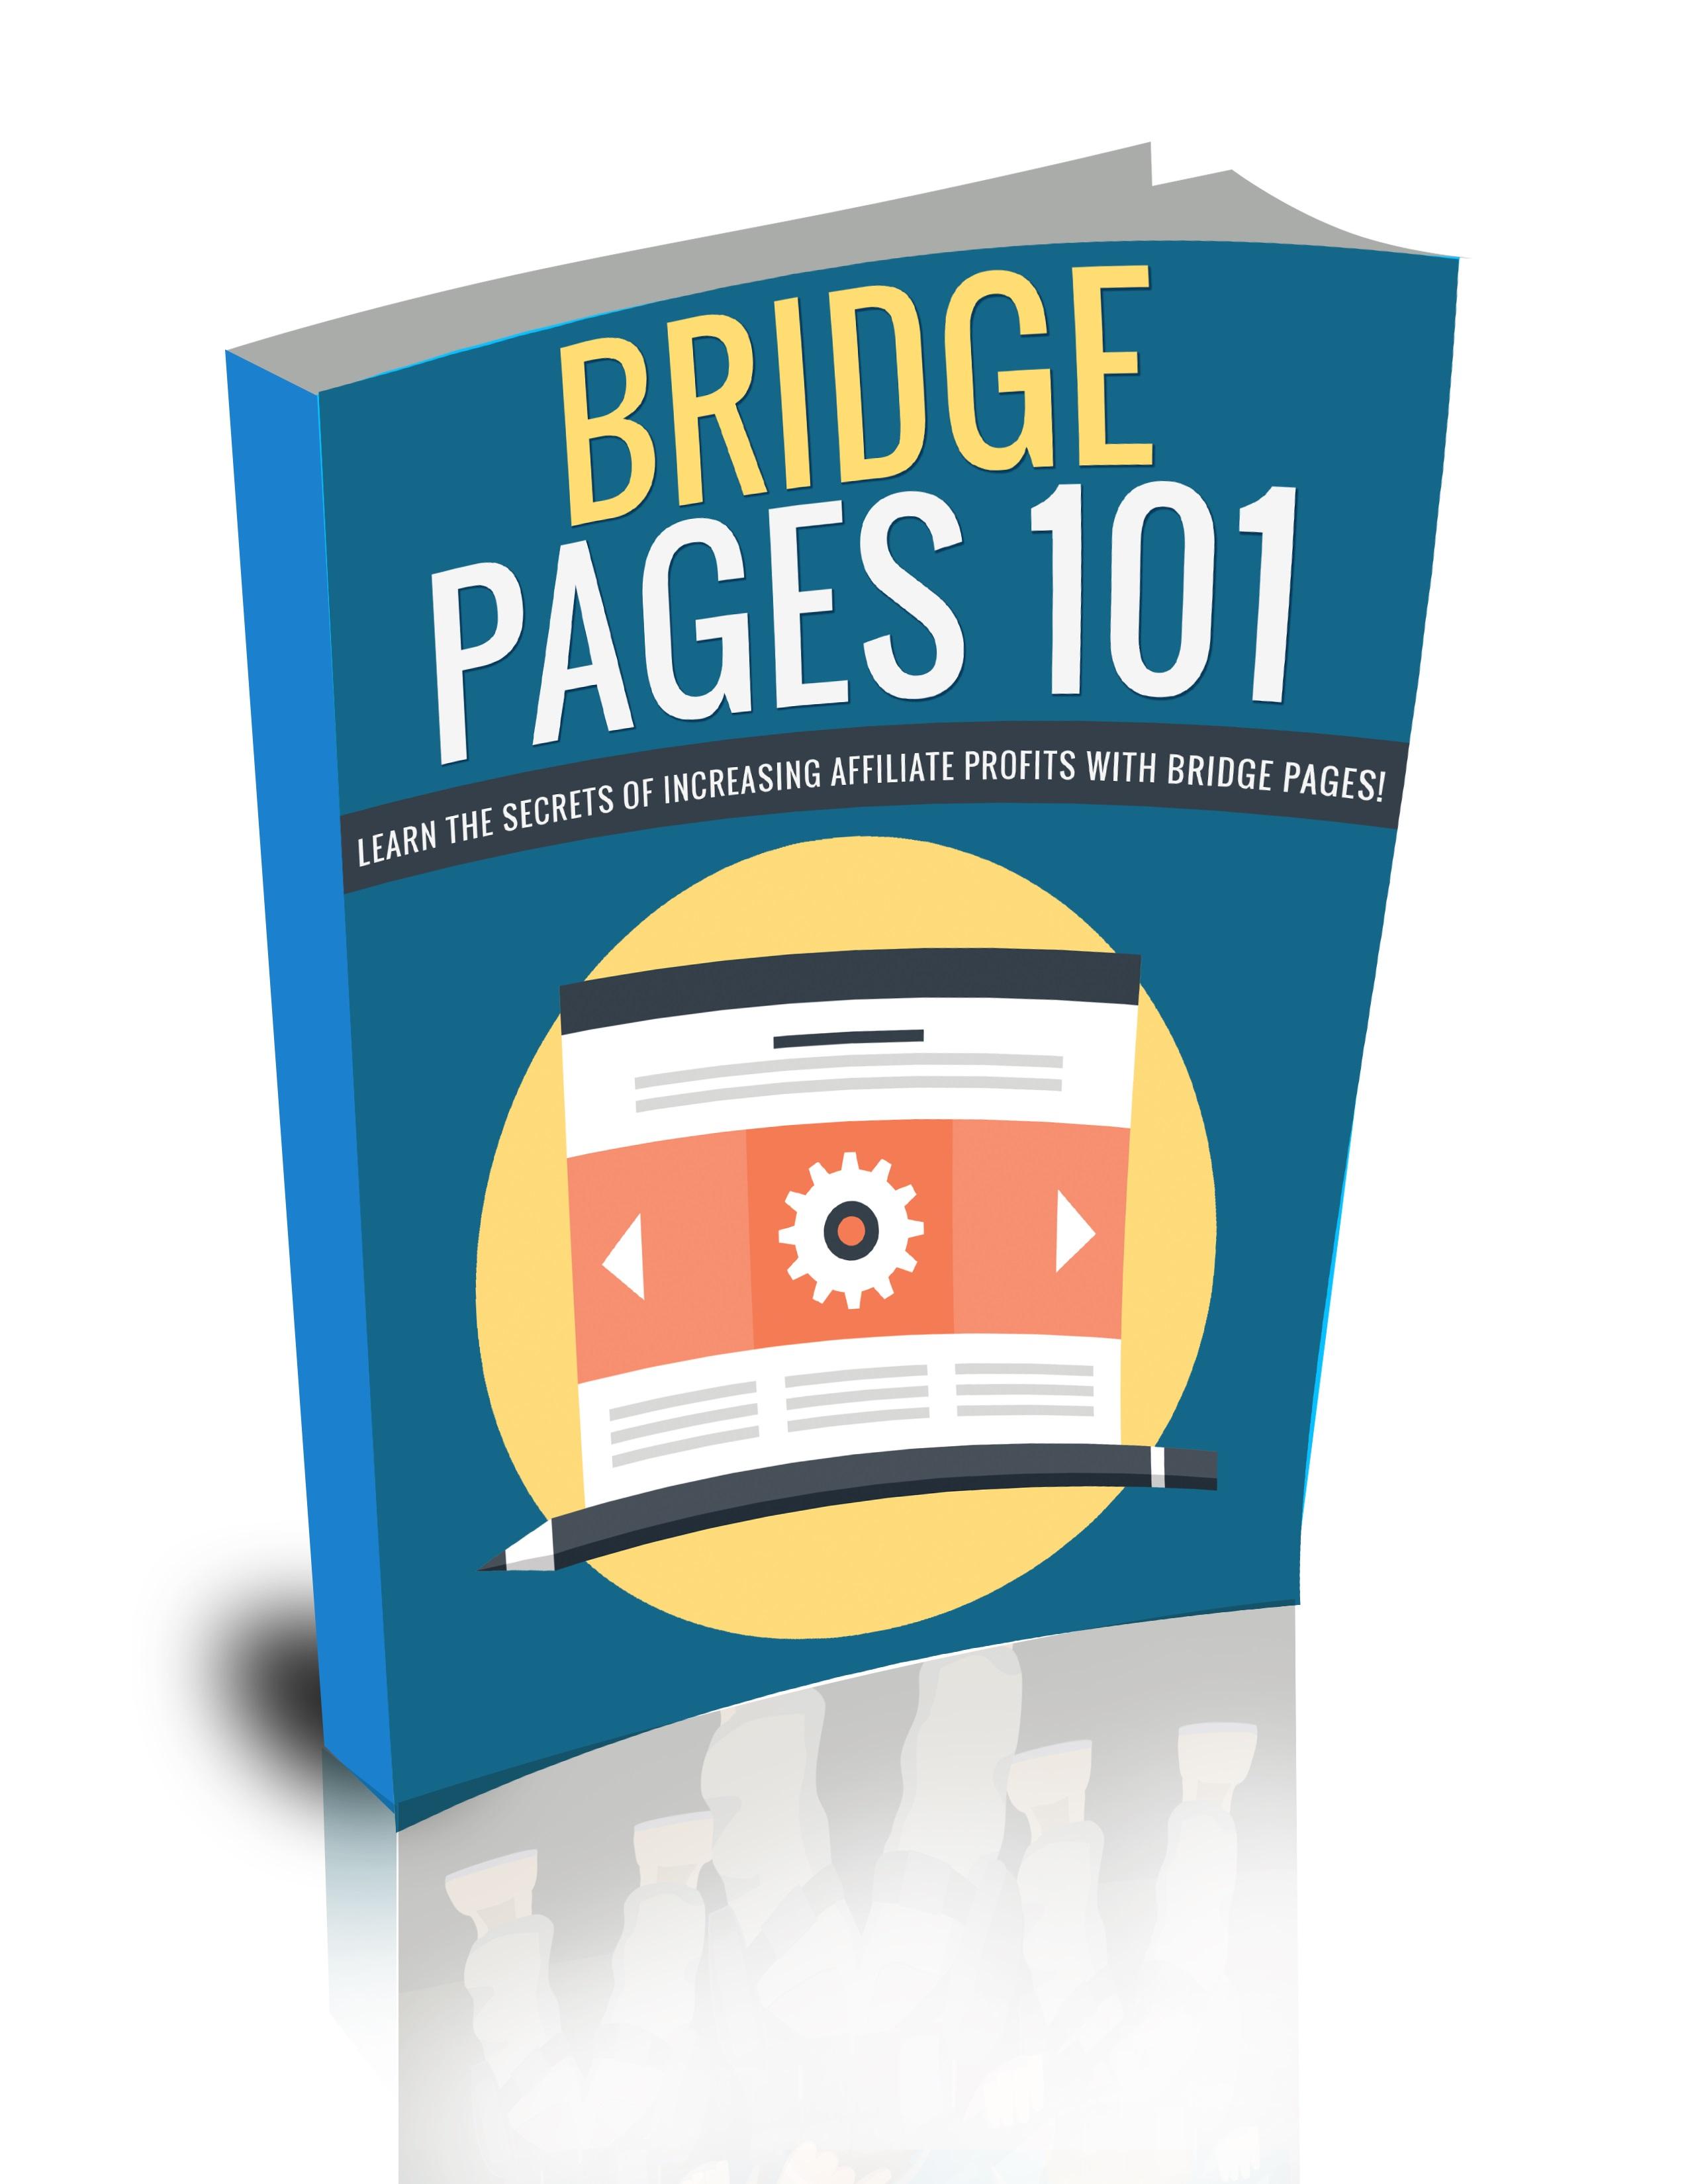 Bridge Pages 101 Package